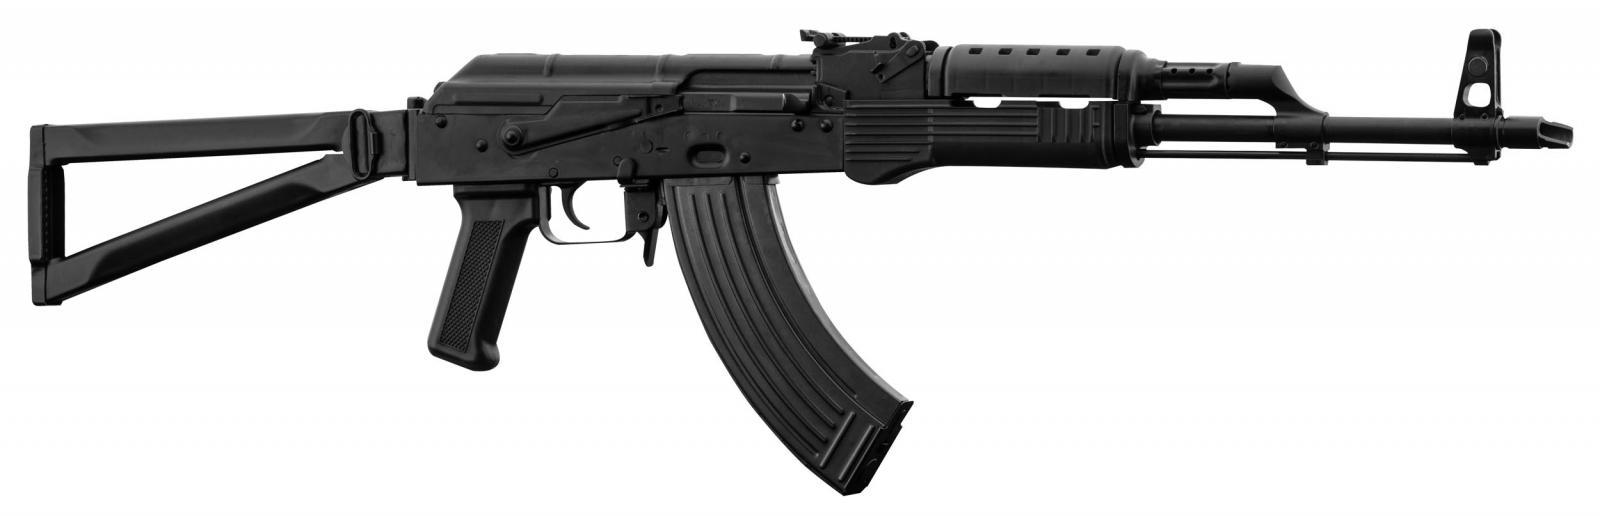 Carabine semi auto K-ARMS (KOLARMS) KA17 Crosse Repliable Cal 7.62x39